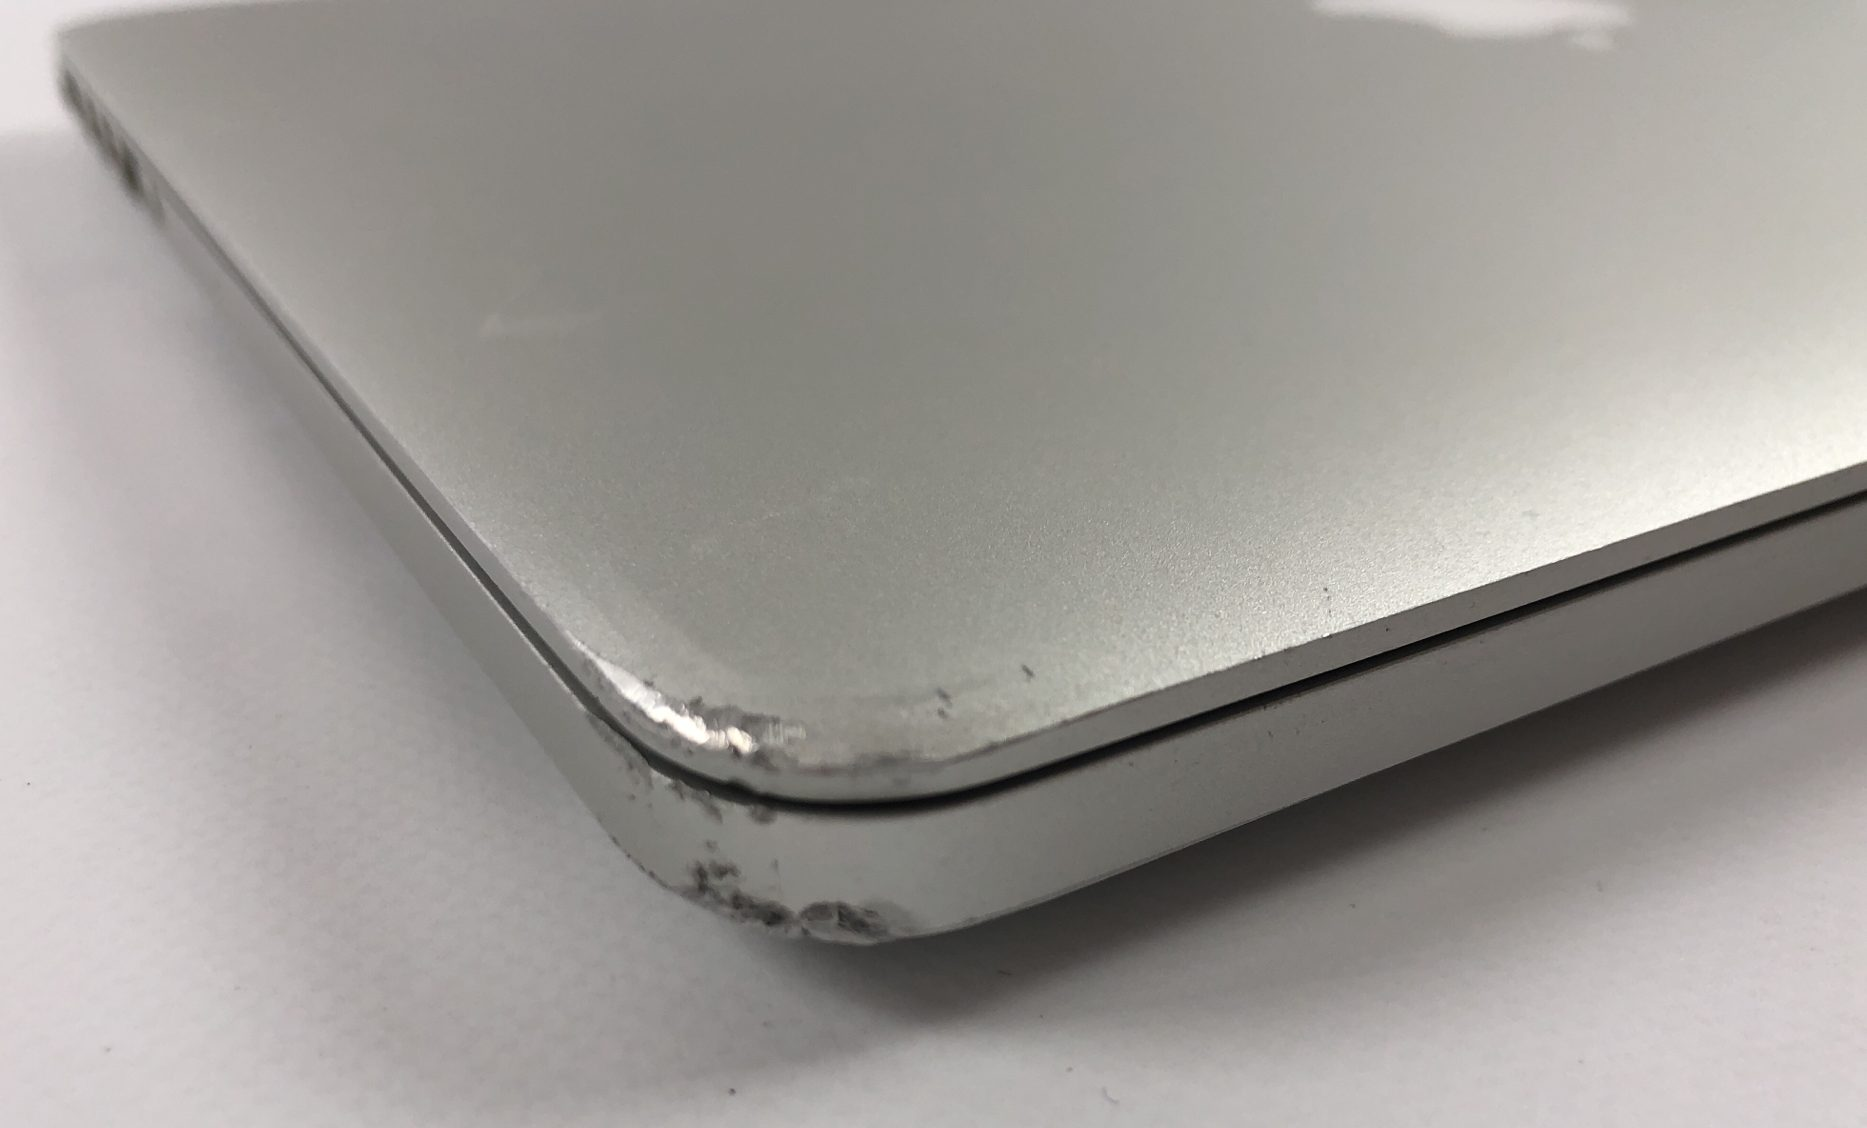 "MacBook Pro Retina 13"" Early 2015 (Intel Core i7 3.1 GHz 16 GB RAM 512 GB SSD), Intel Core i7 3.1 GHz, 16 GB RAM, 512 GB SSD, Afbeelding 5"